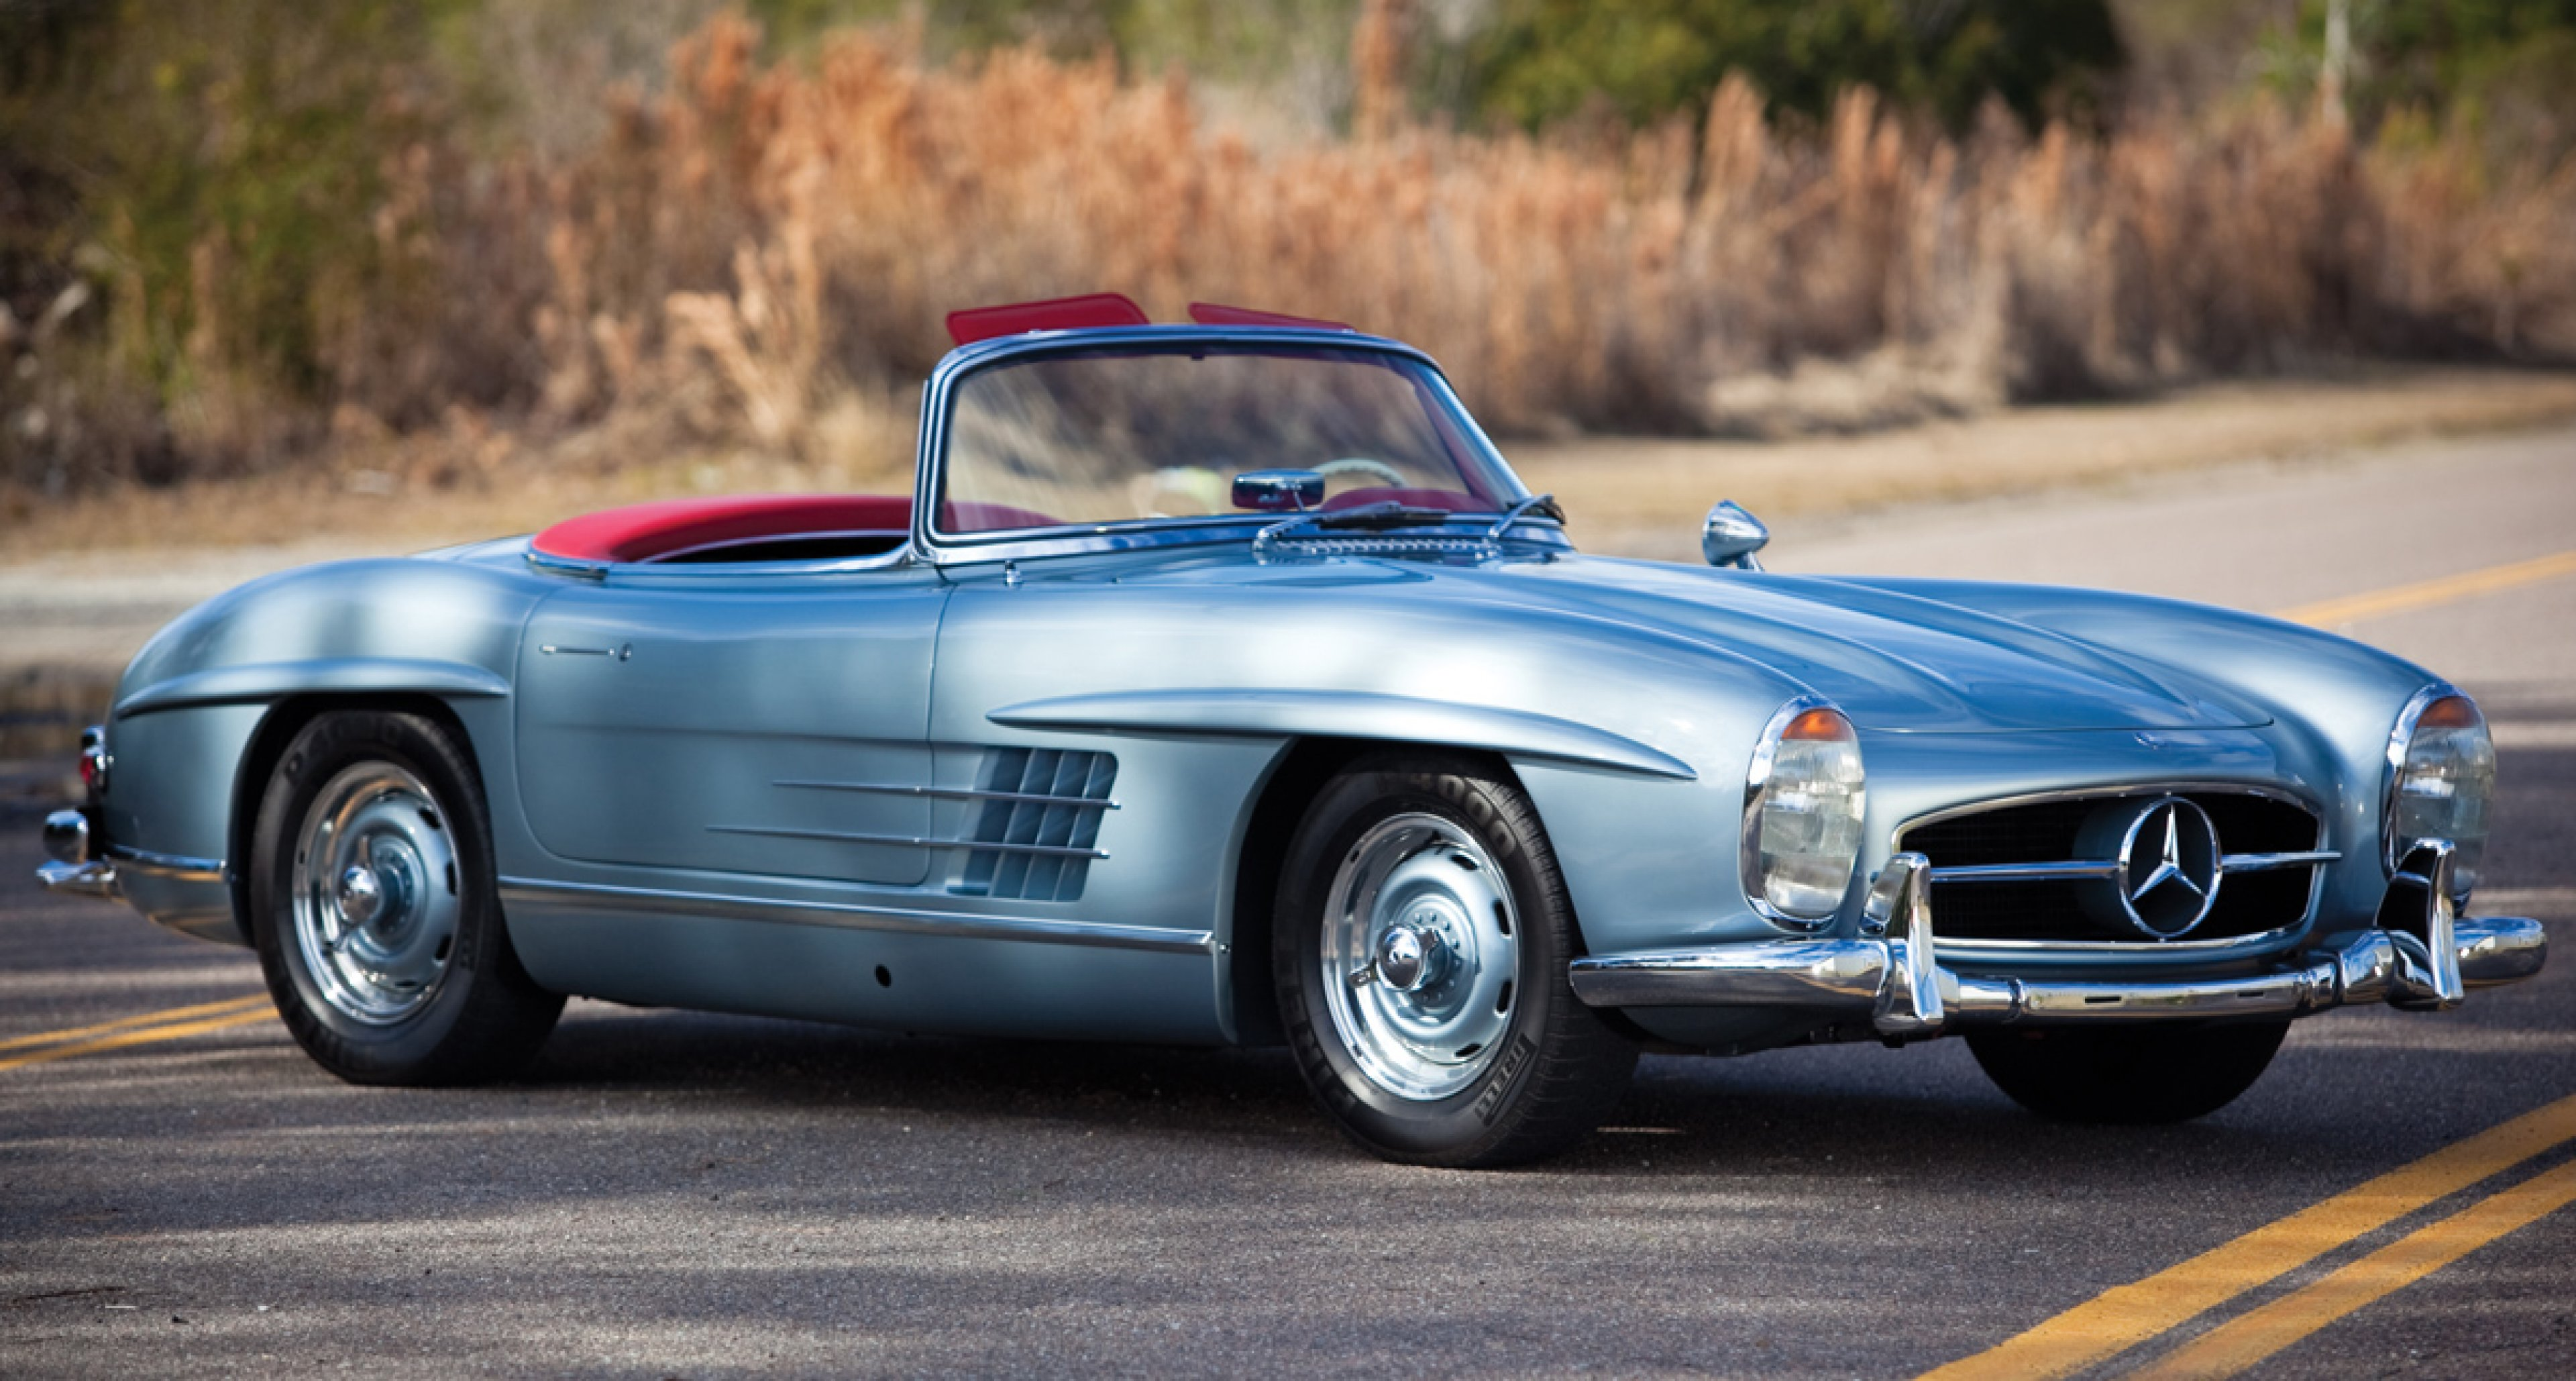 1957 Mercede-Benz 300 SL ex Natalie Wood